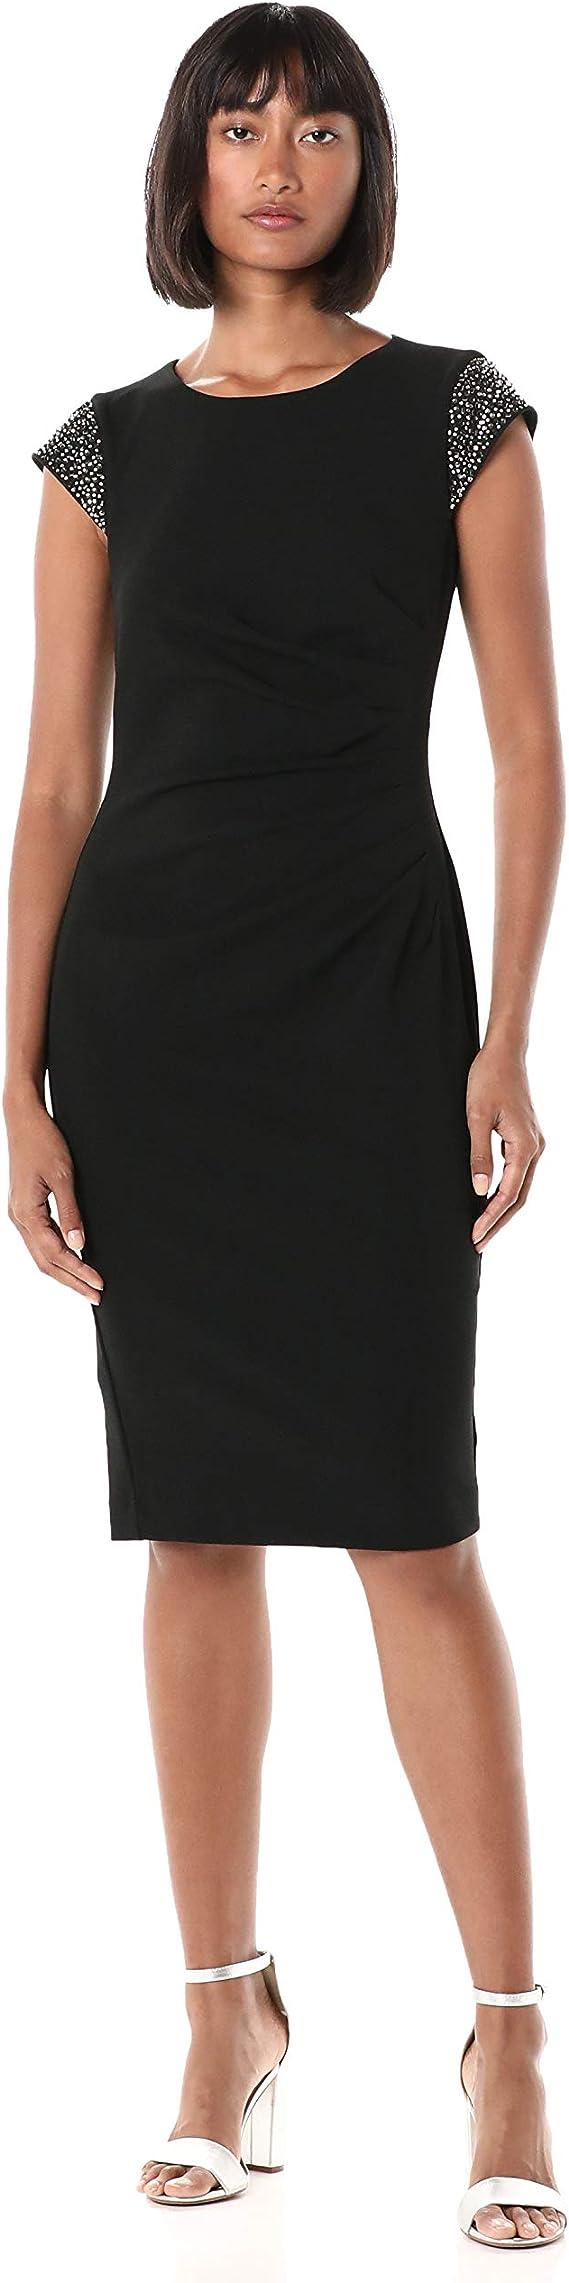 Calvin Klein 卡尔文克莱因 CK连衣裙 1.8折$24.91 海淘转运到手约¥203